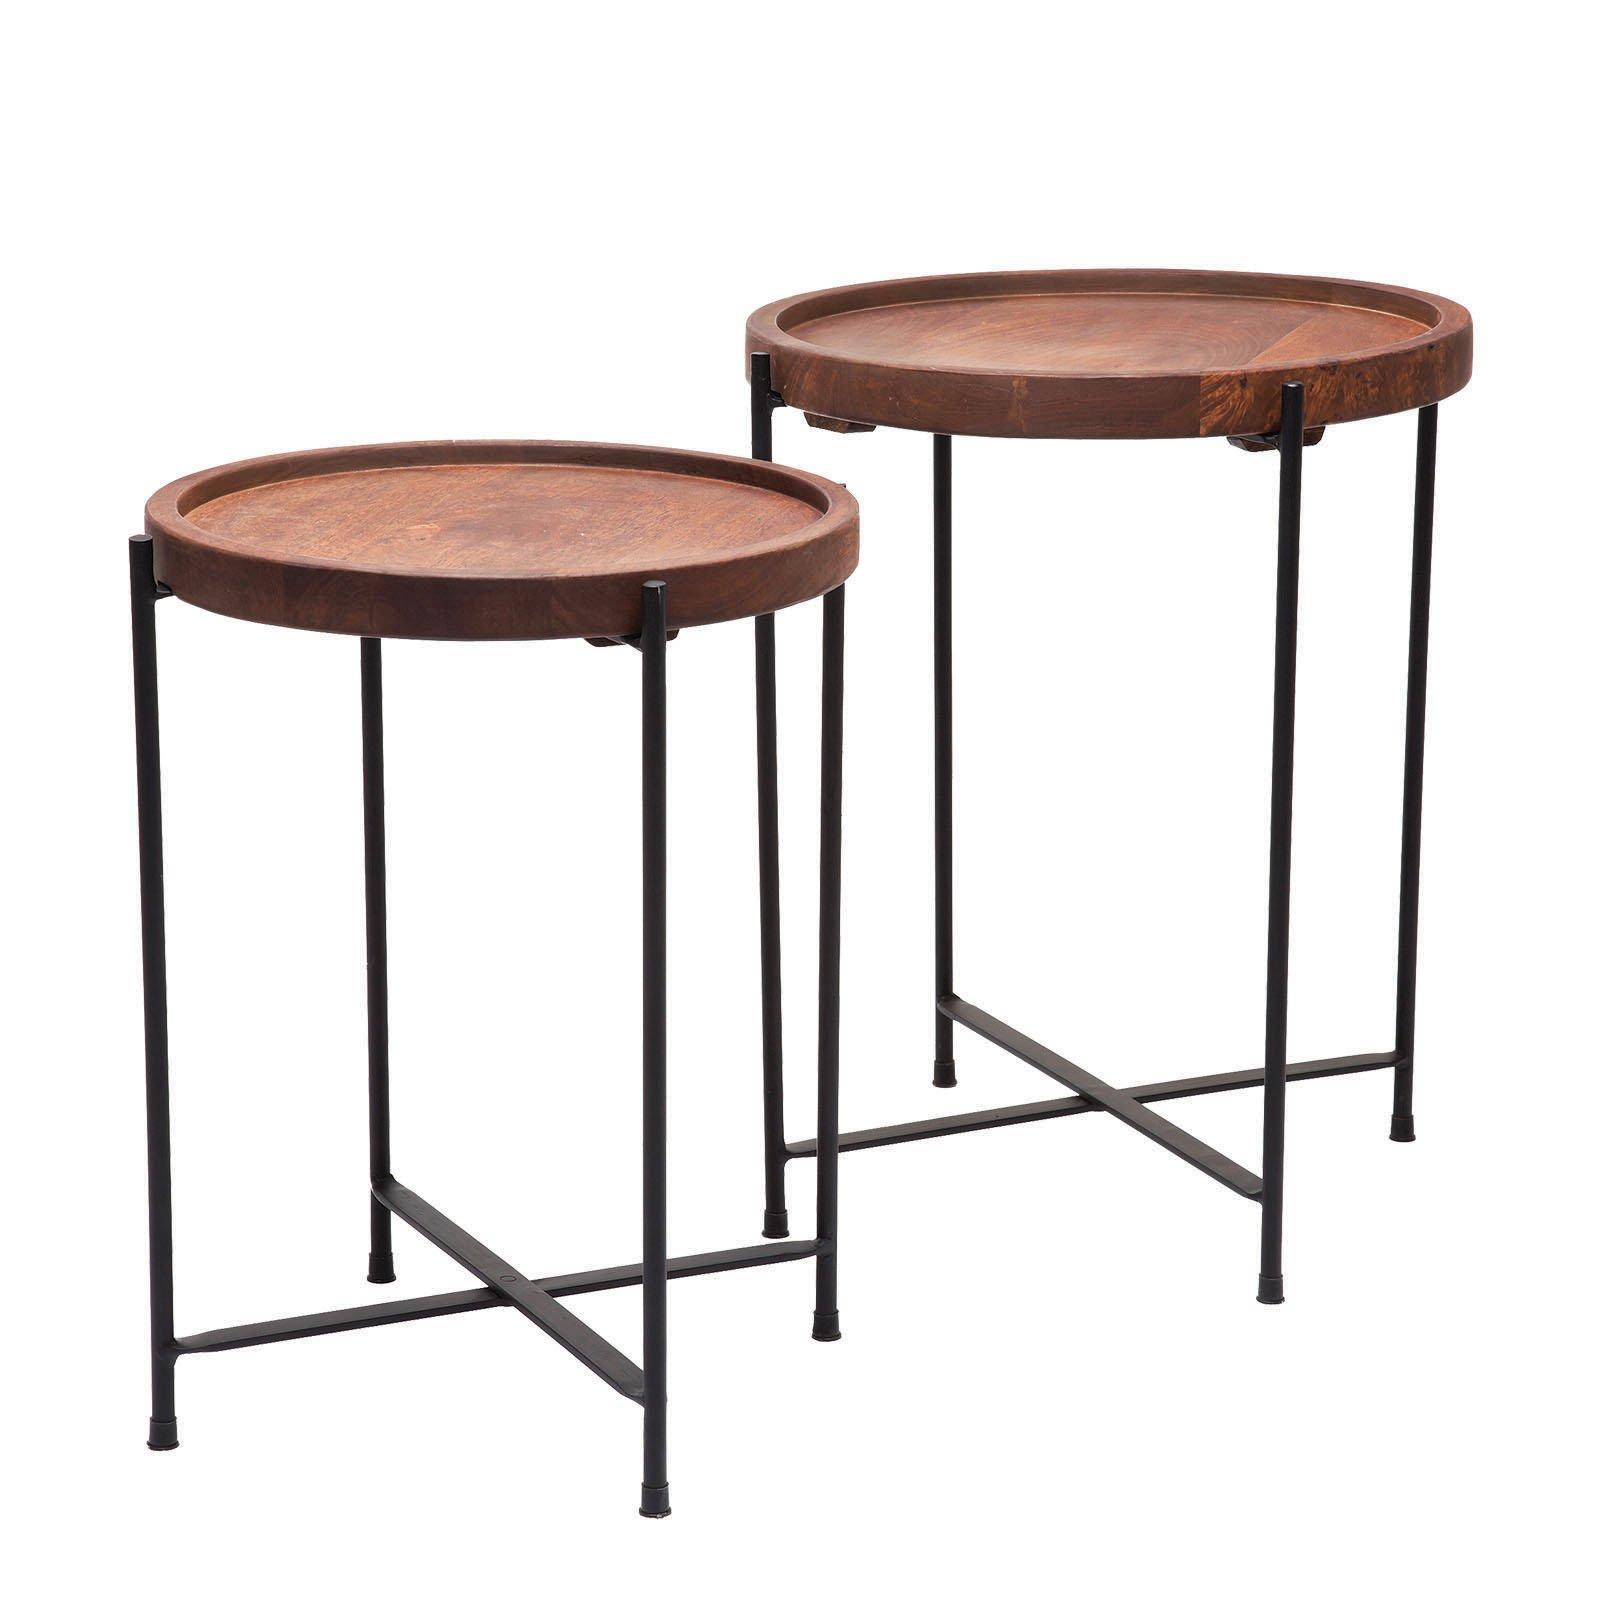 Kare Design Bijzettafel set hout staal 45 x 40 x 40